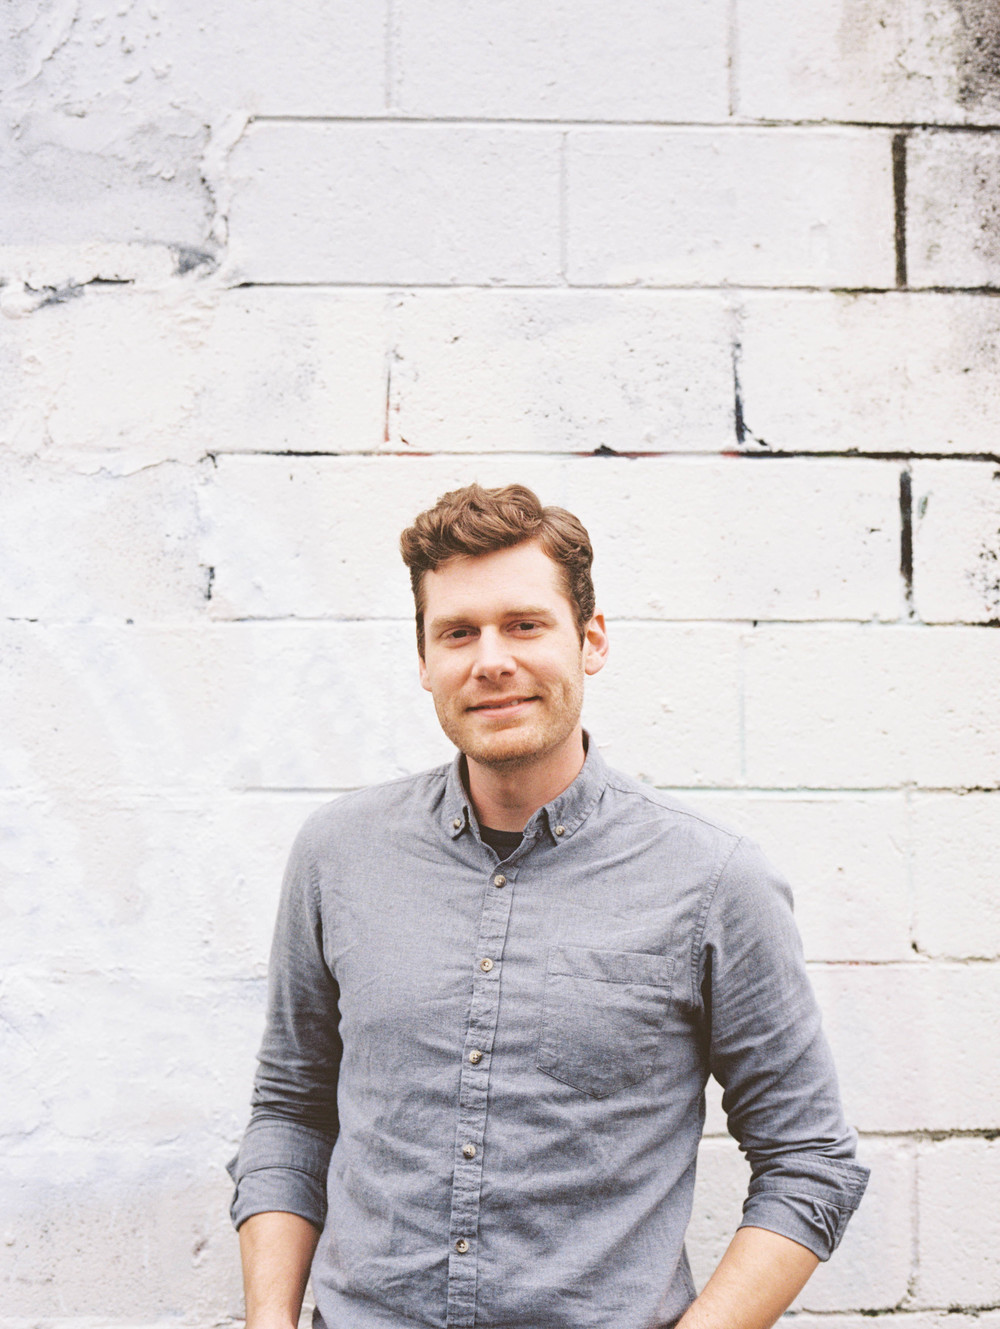 JONATHAN MUNN Owner / Lead Editor